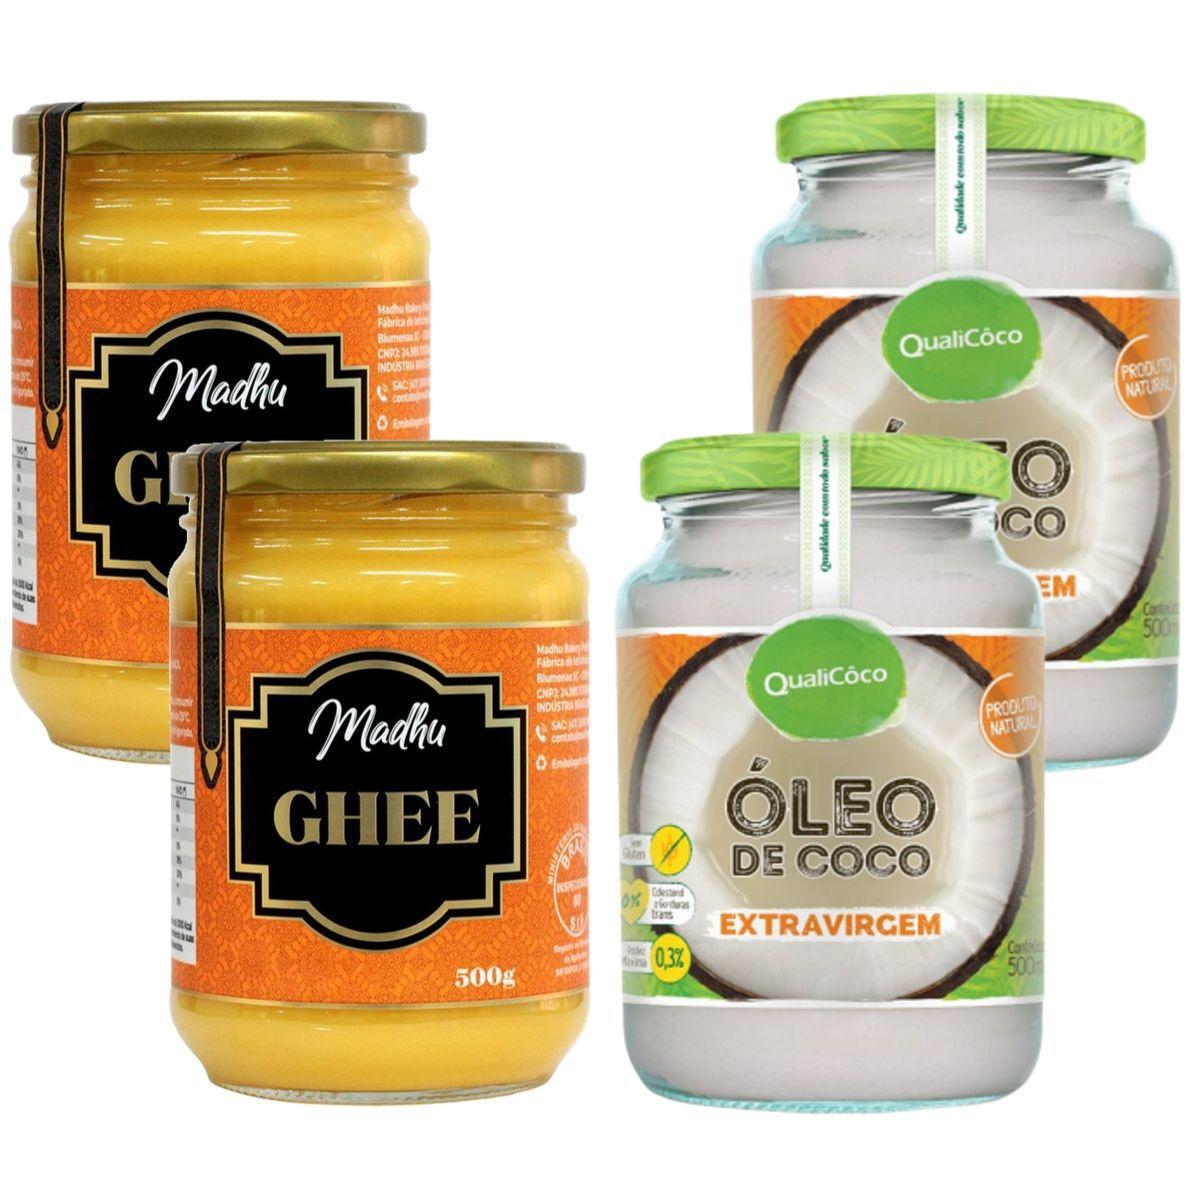 Kit 2 Oleo De Coco Extra Virgem 500ml + 2 Manteiga Ghee Clarificada 500ml